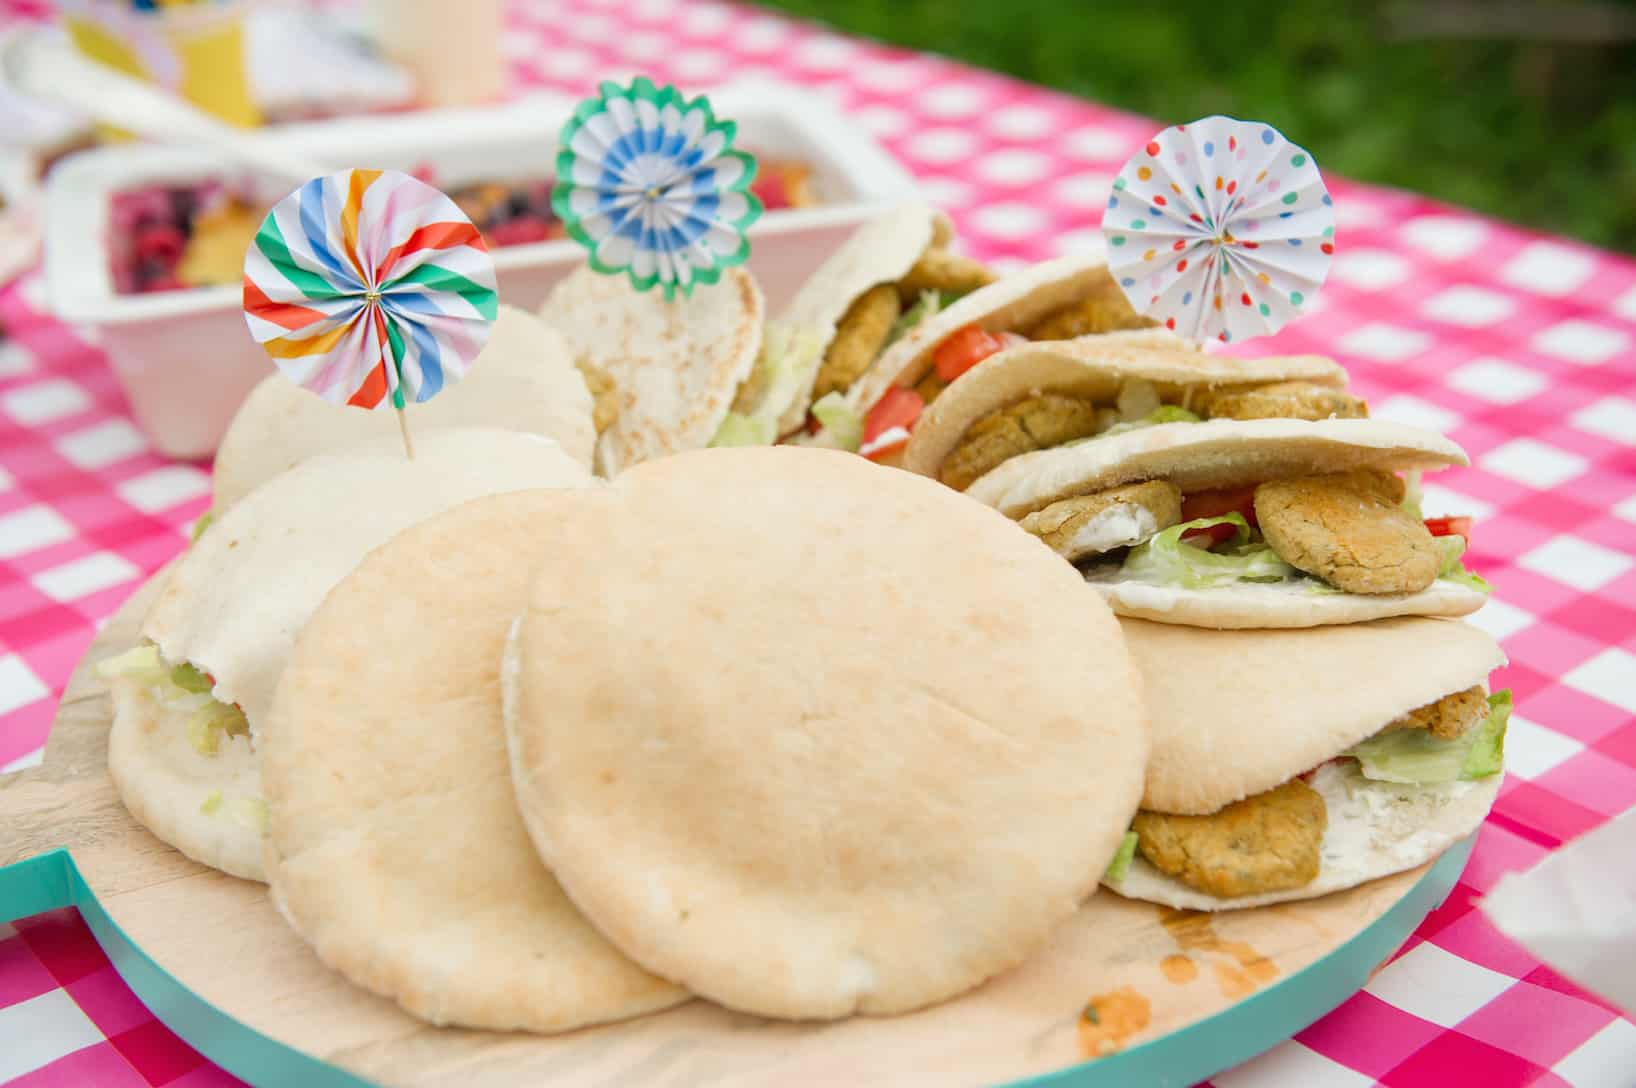 broodjes-falafel-met-knoflooksaus-3